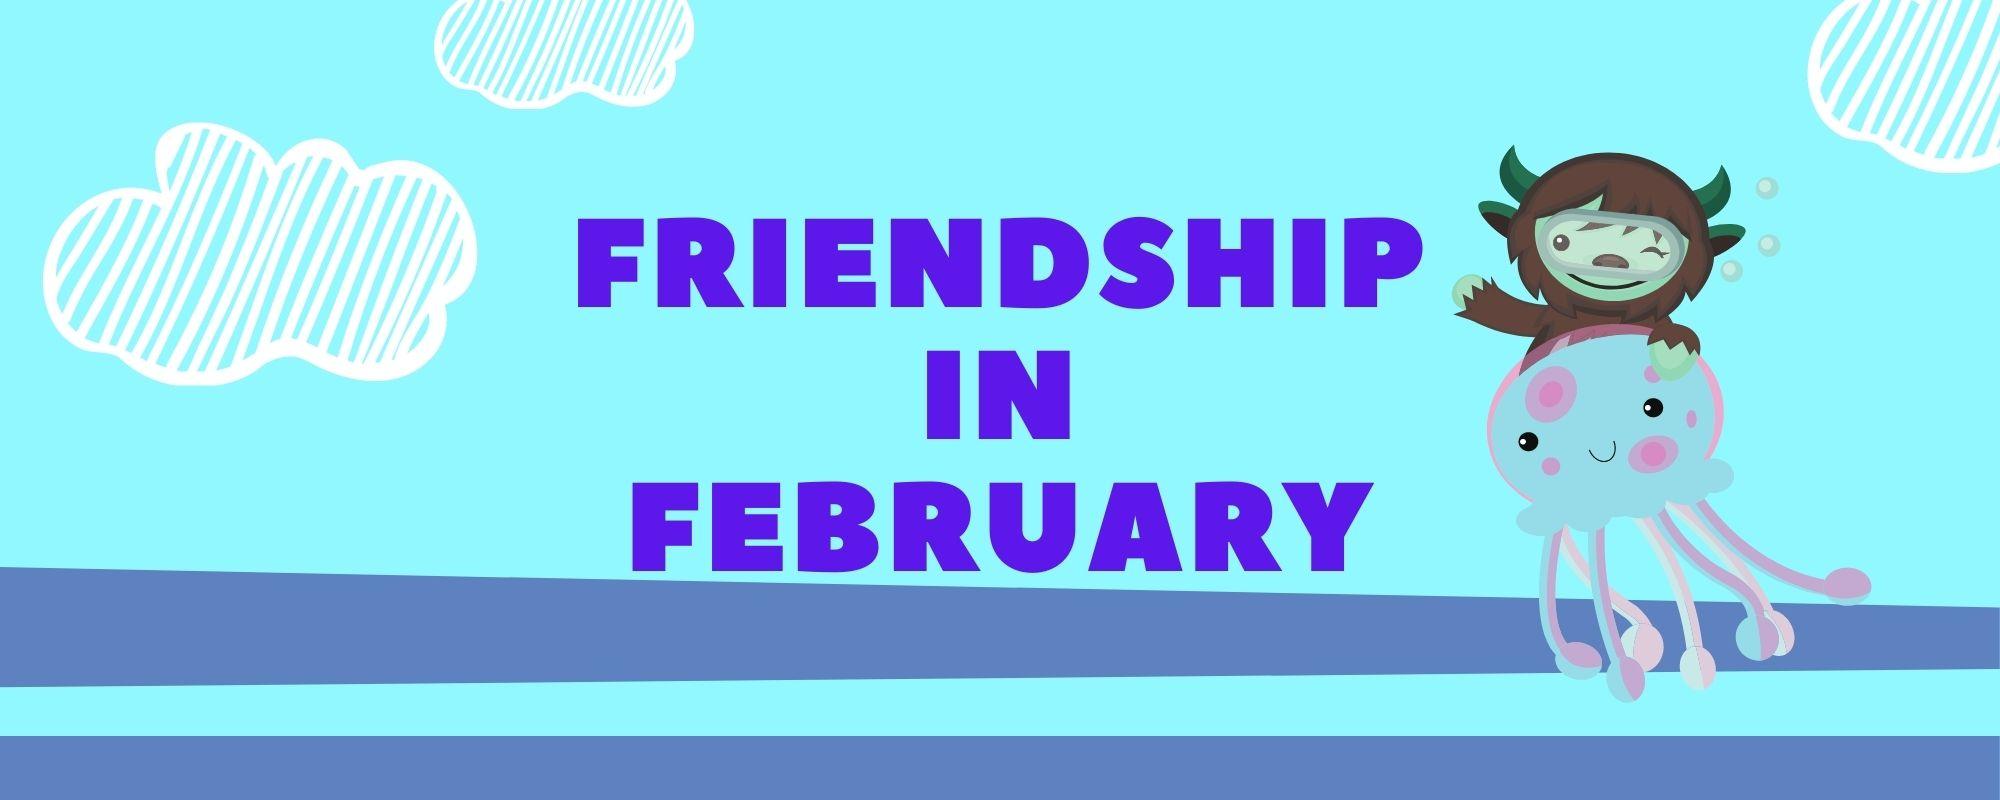 Friendship in February